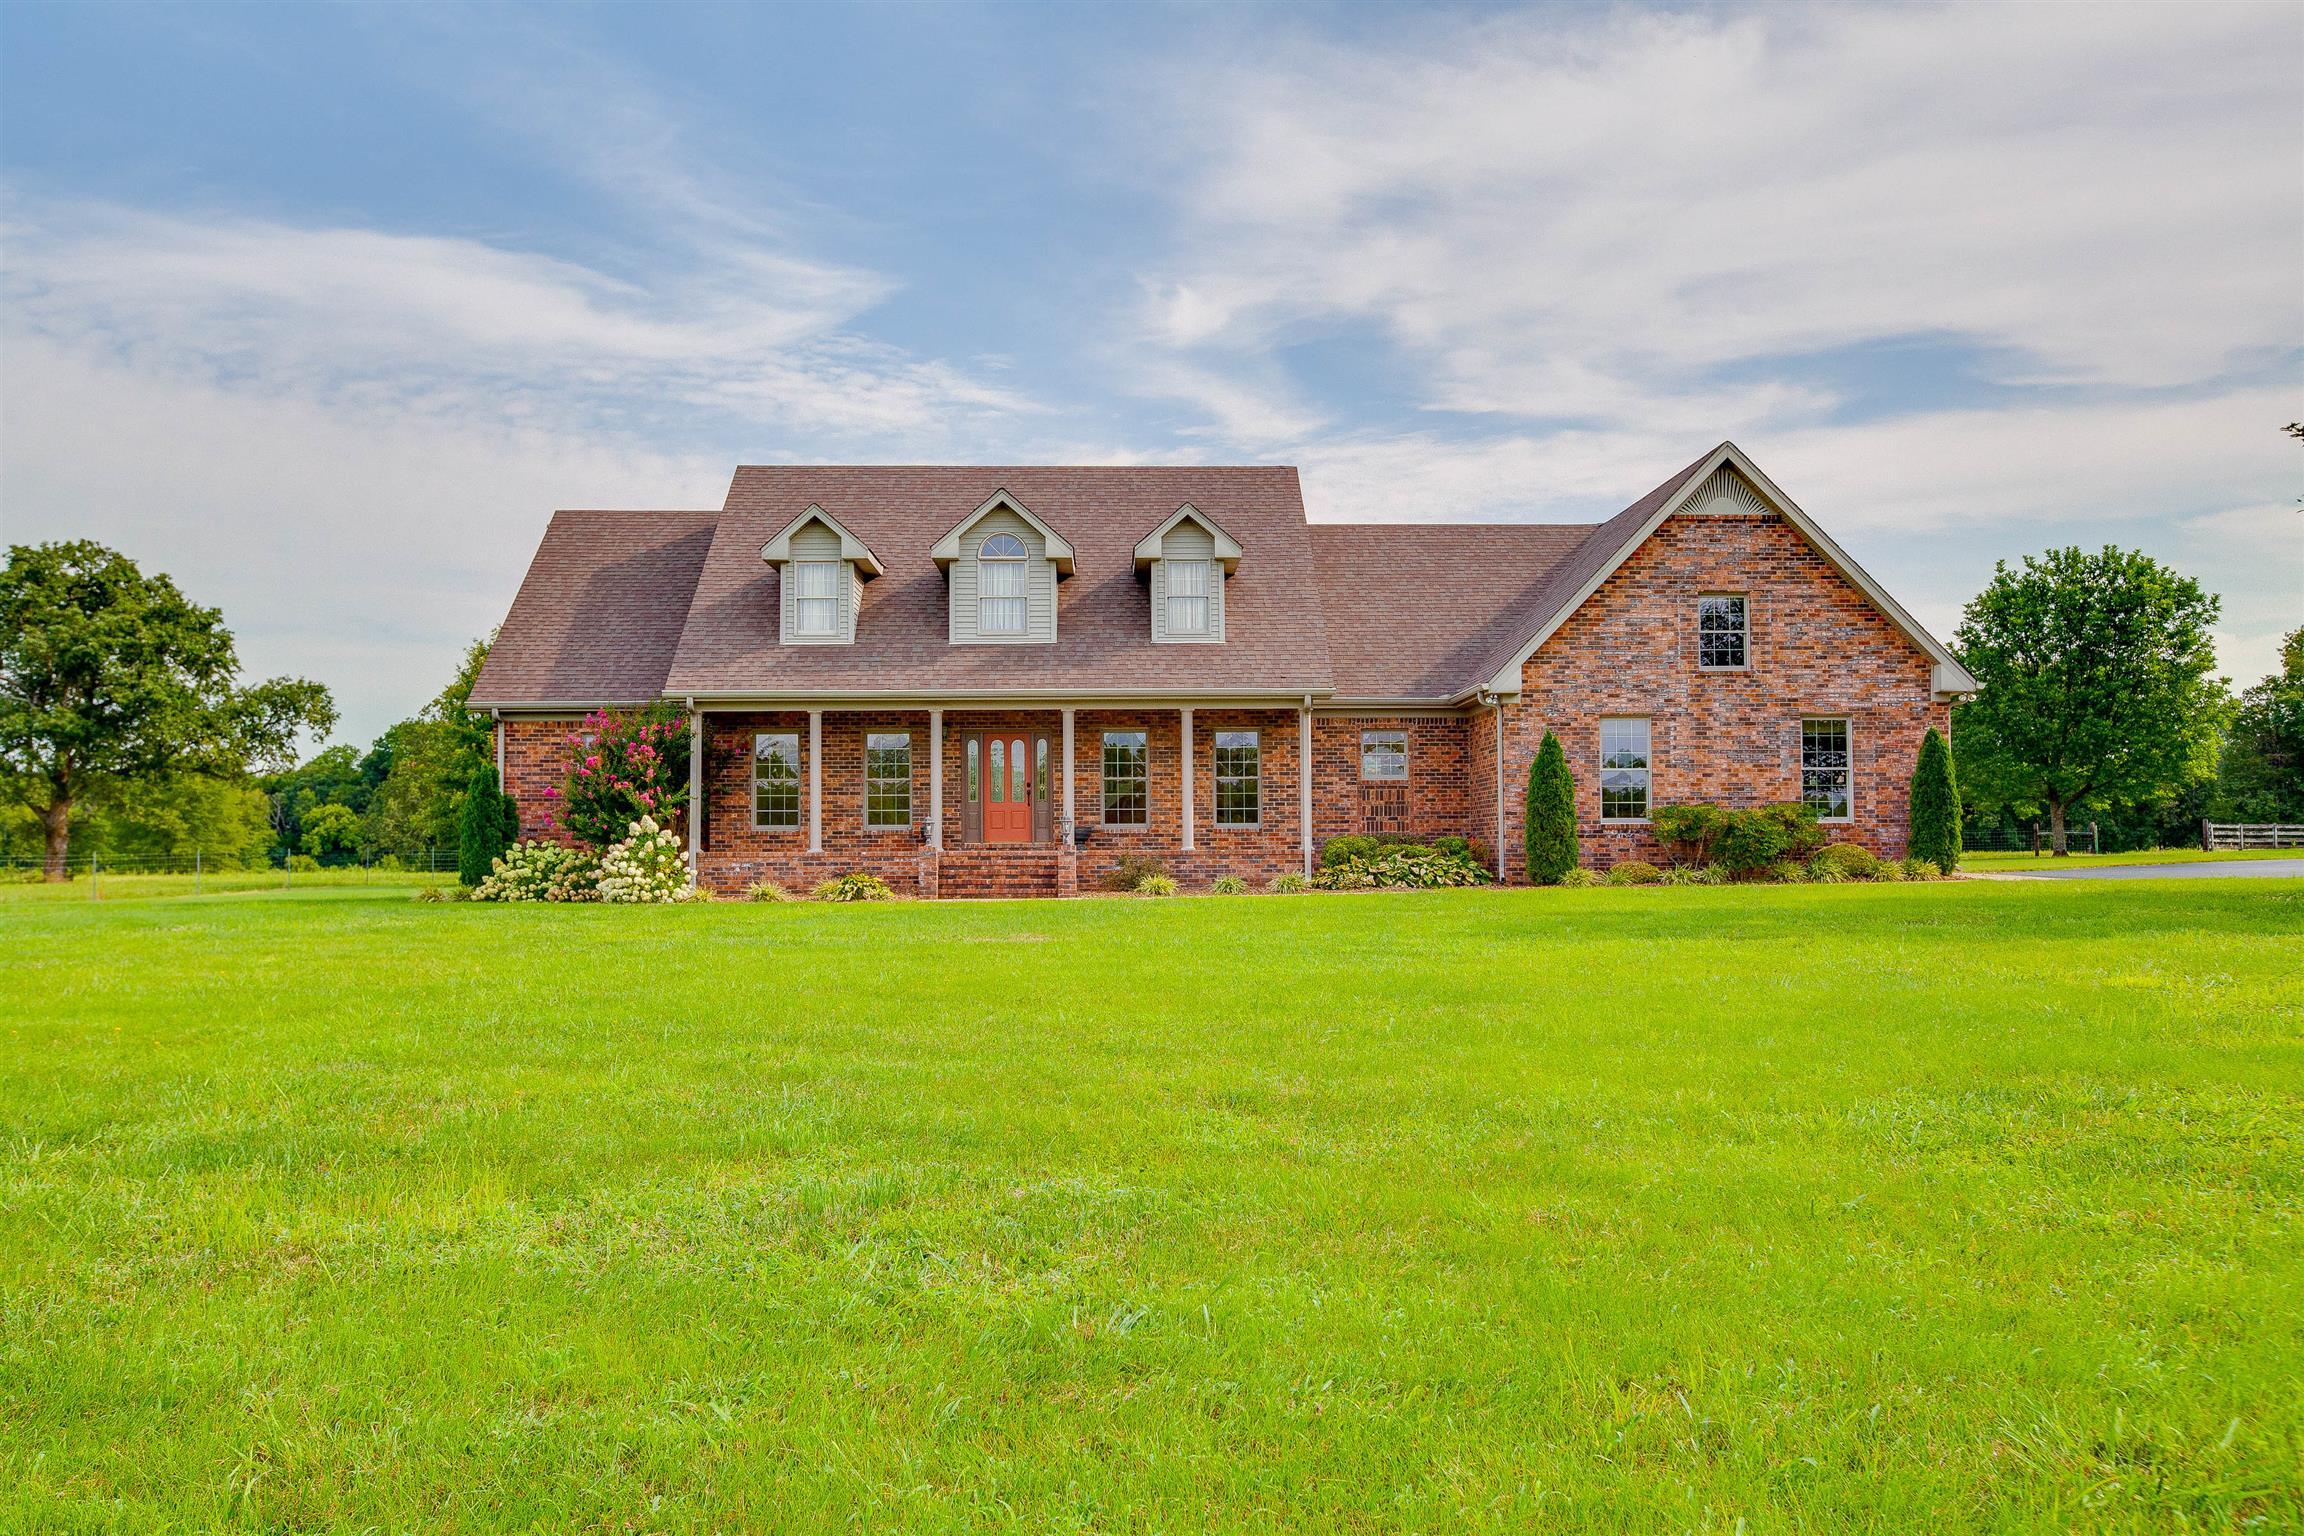 4190 Murfreesboro Rd, Lebanon, TN 37090 - Lebanon, TN real estate listing